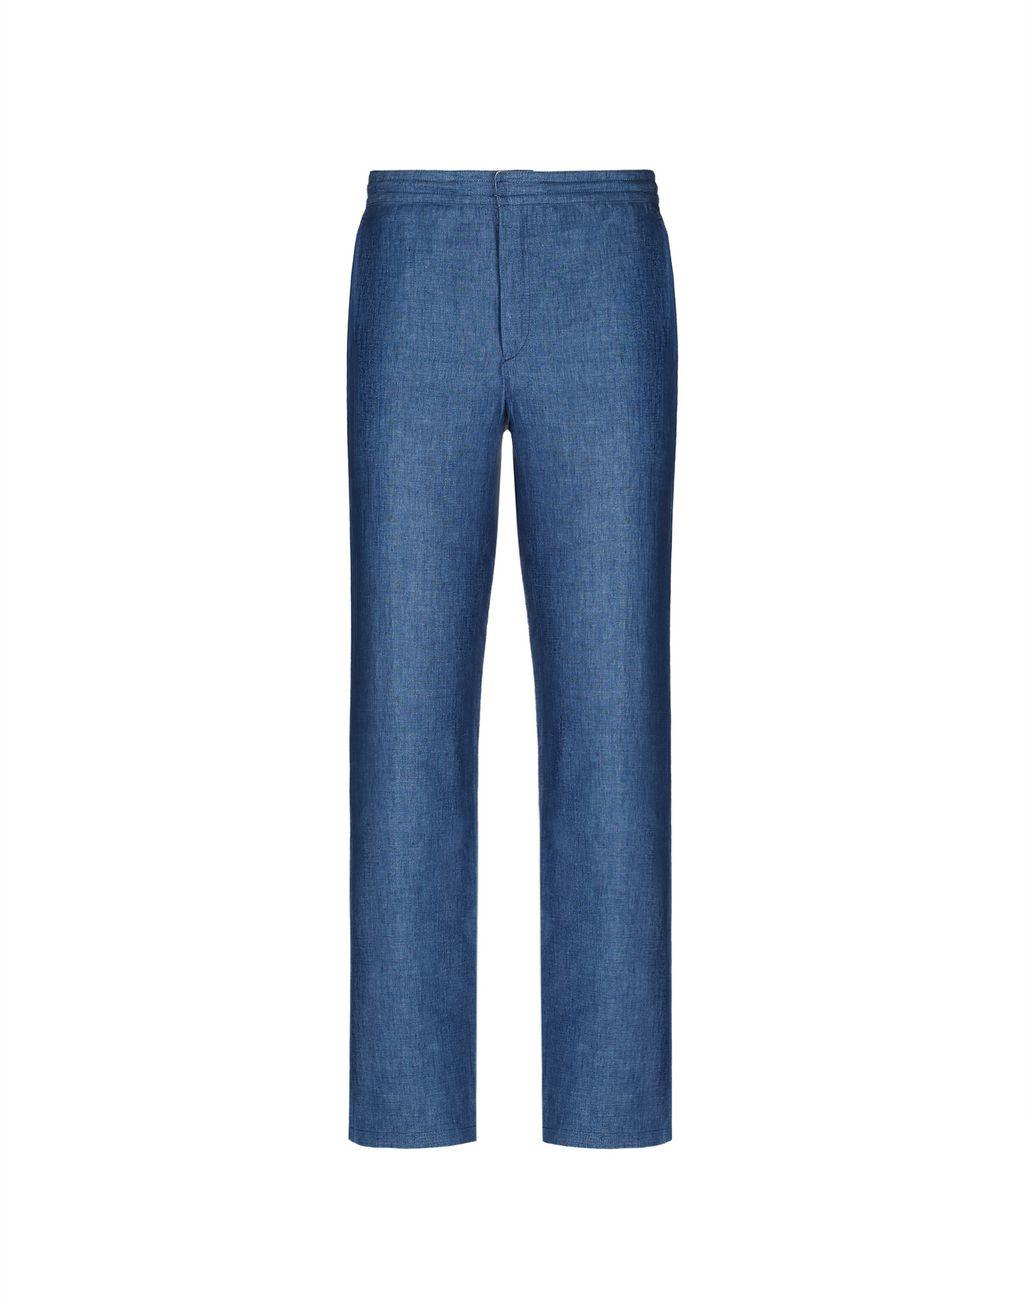 BRIONI Blue Linen Trousers Trousers Man f